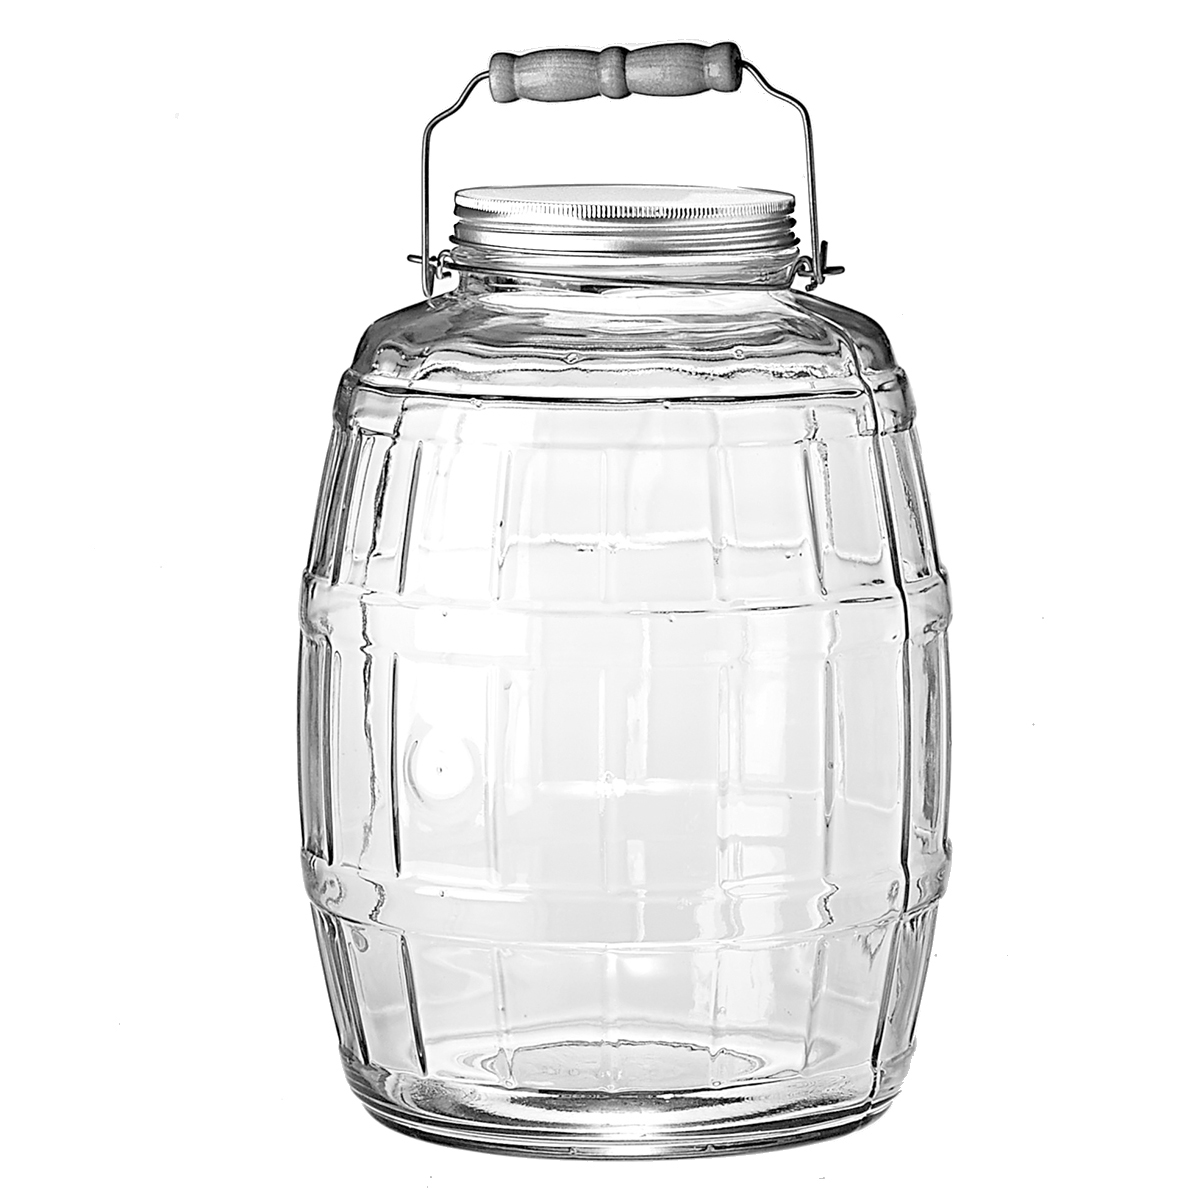 Anchor Hocking Foodservice 85679AHG17 storage jar / ingredient canister, glass